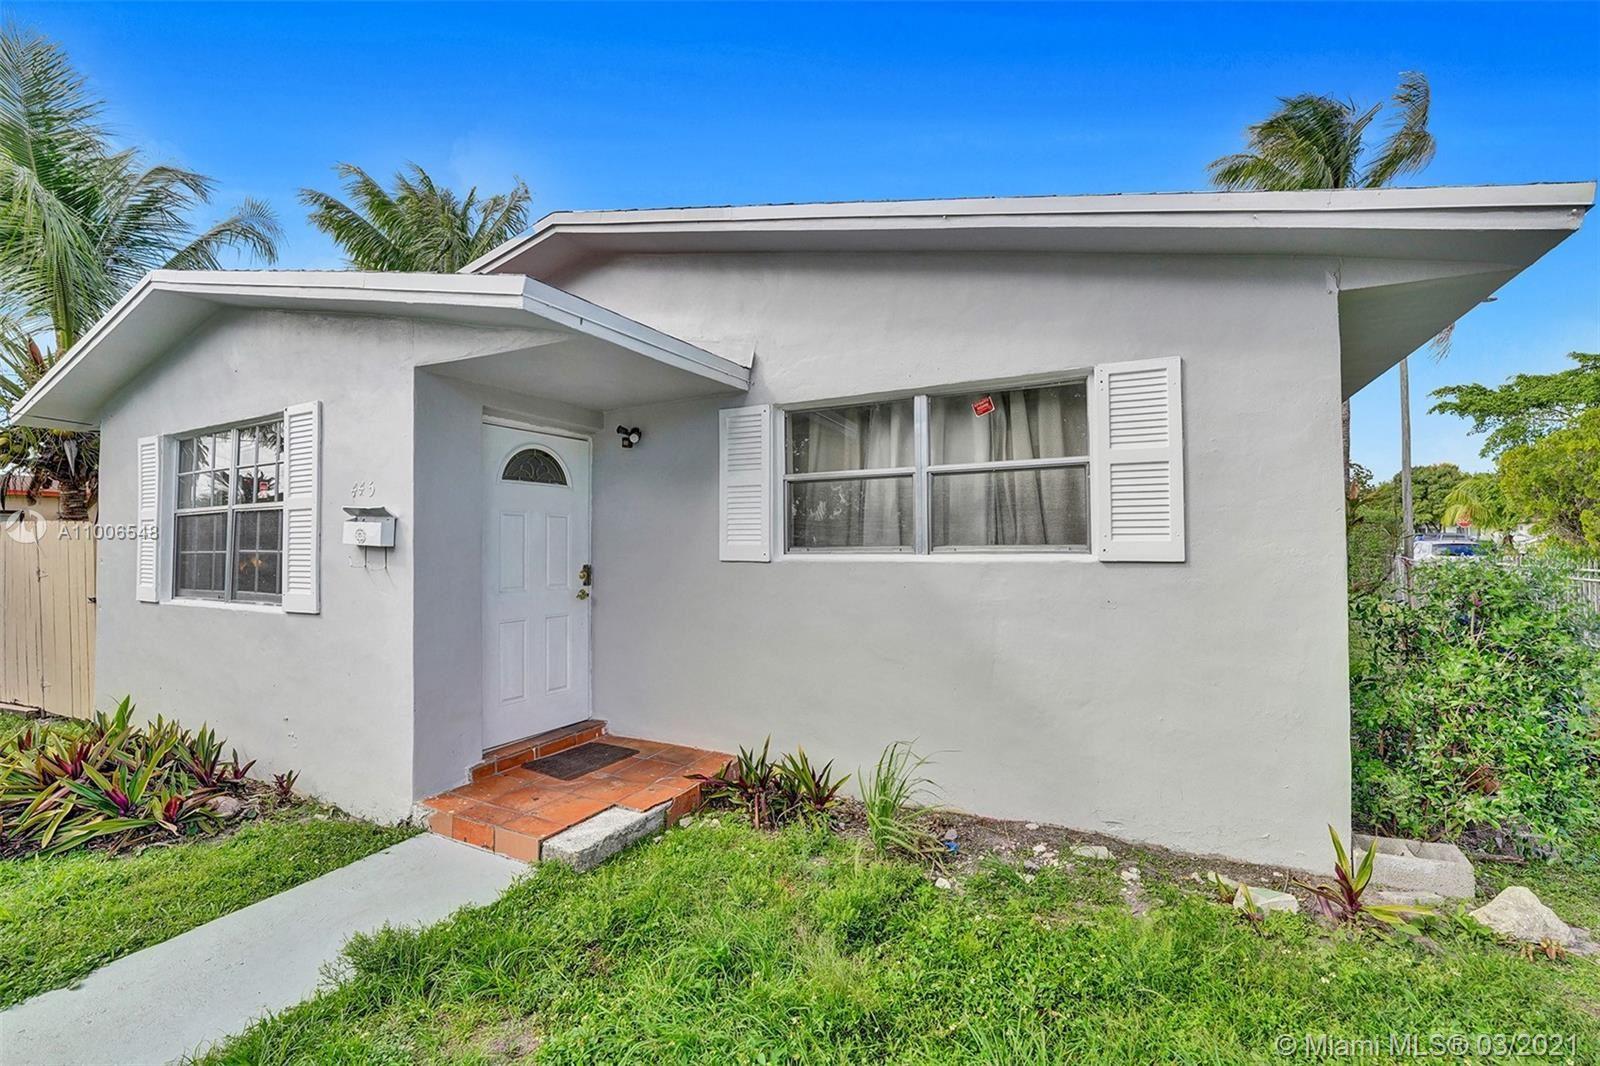 445 NE 173rd St, North Miami Beach, FL 33162 - #: A11006548